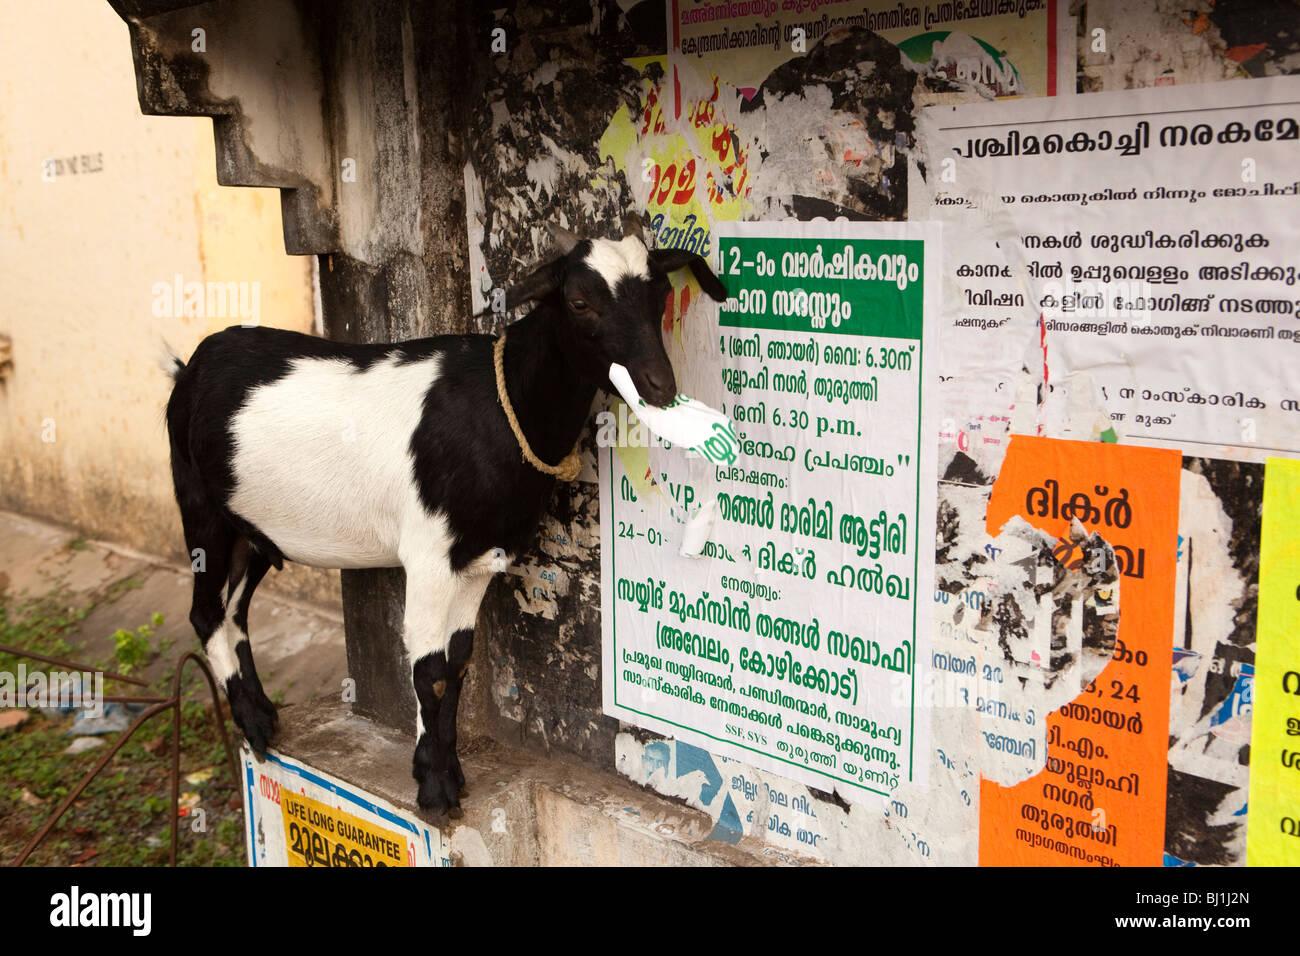 India, Kerala, Kochi, Fort Cochin, River Calvathy Road, goat eating paper torn from malayallam language poster Stock Photo